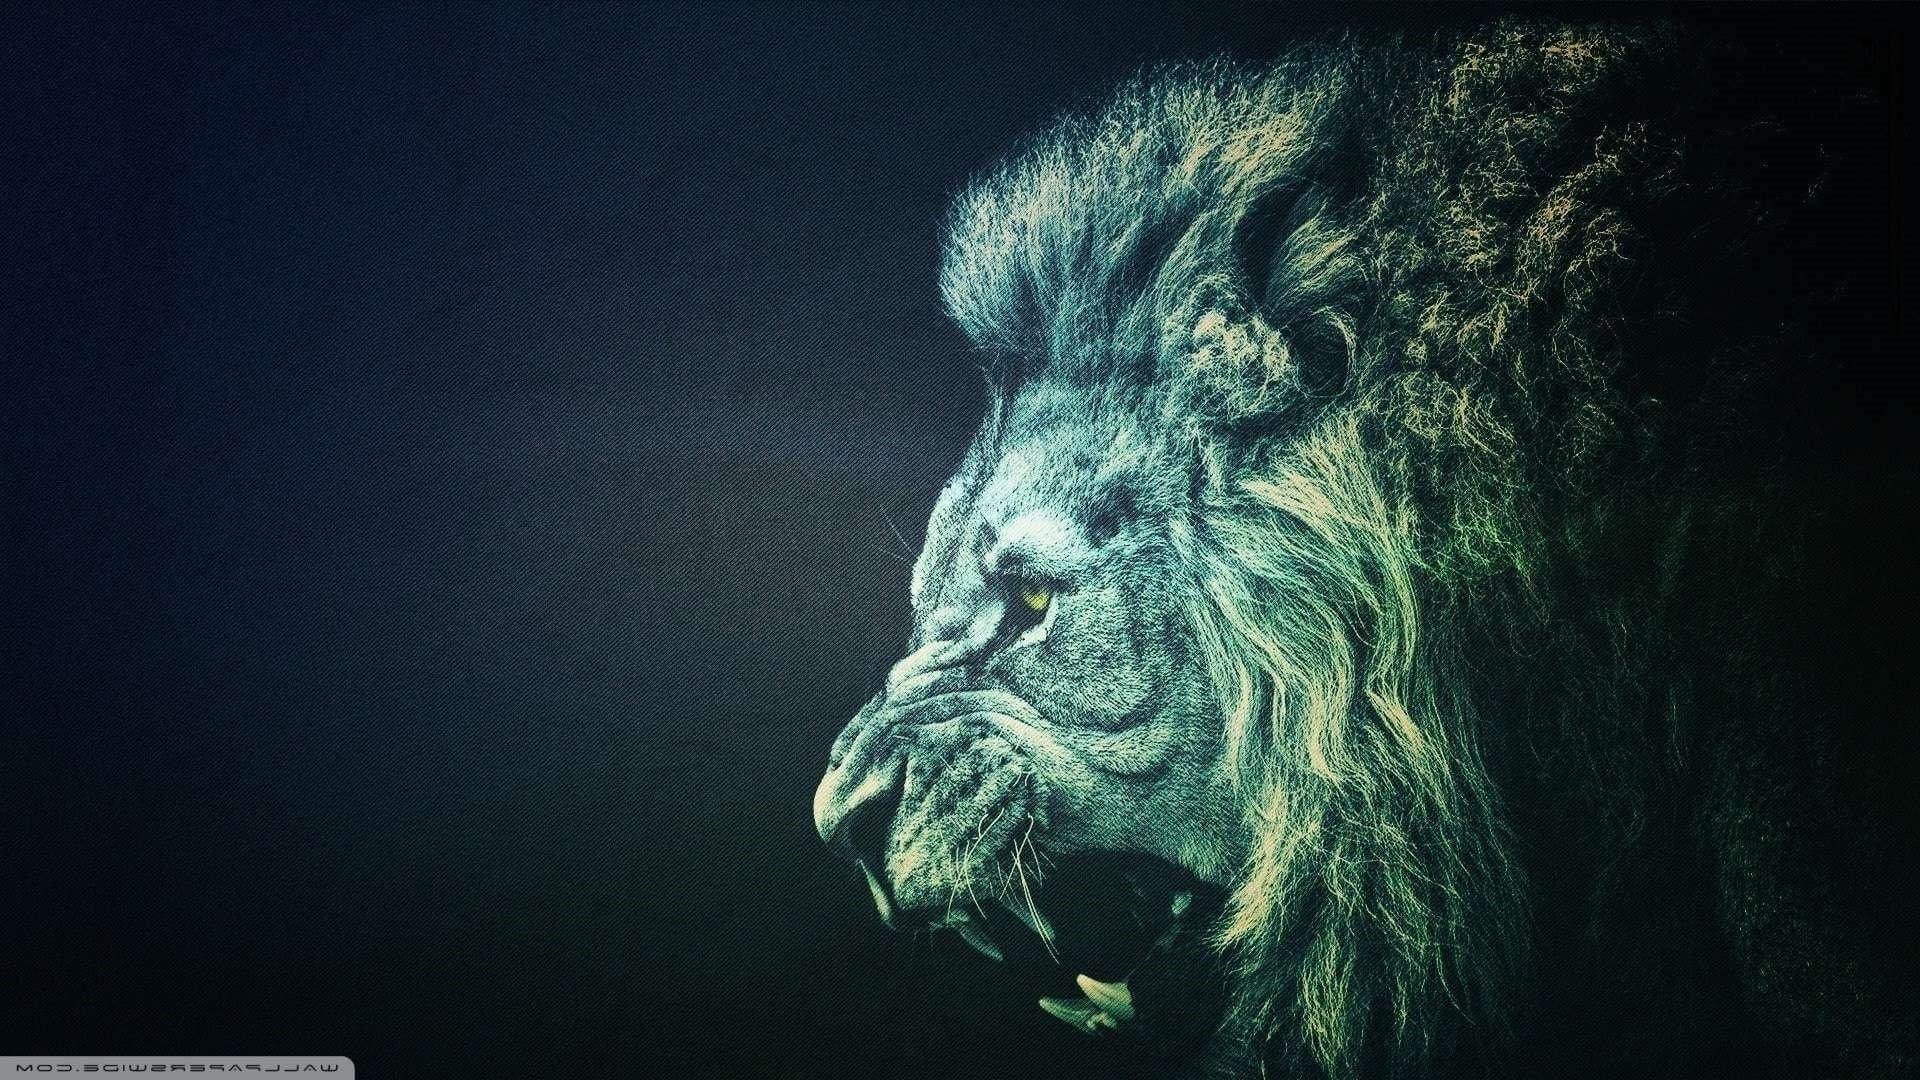 Cool Lion Wallpapers FjZL39 Cool Lion Wallpaper Cool Lion Wallpaper Hd …